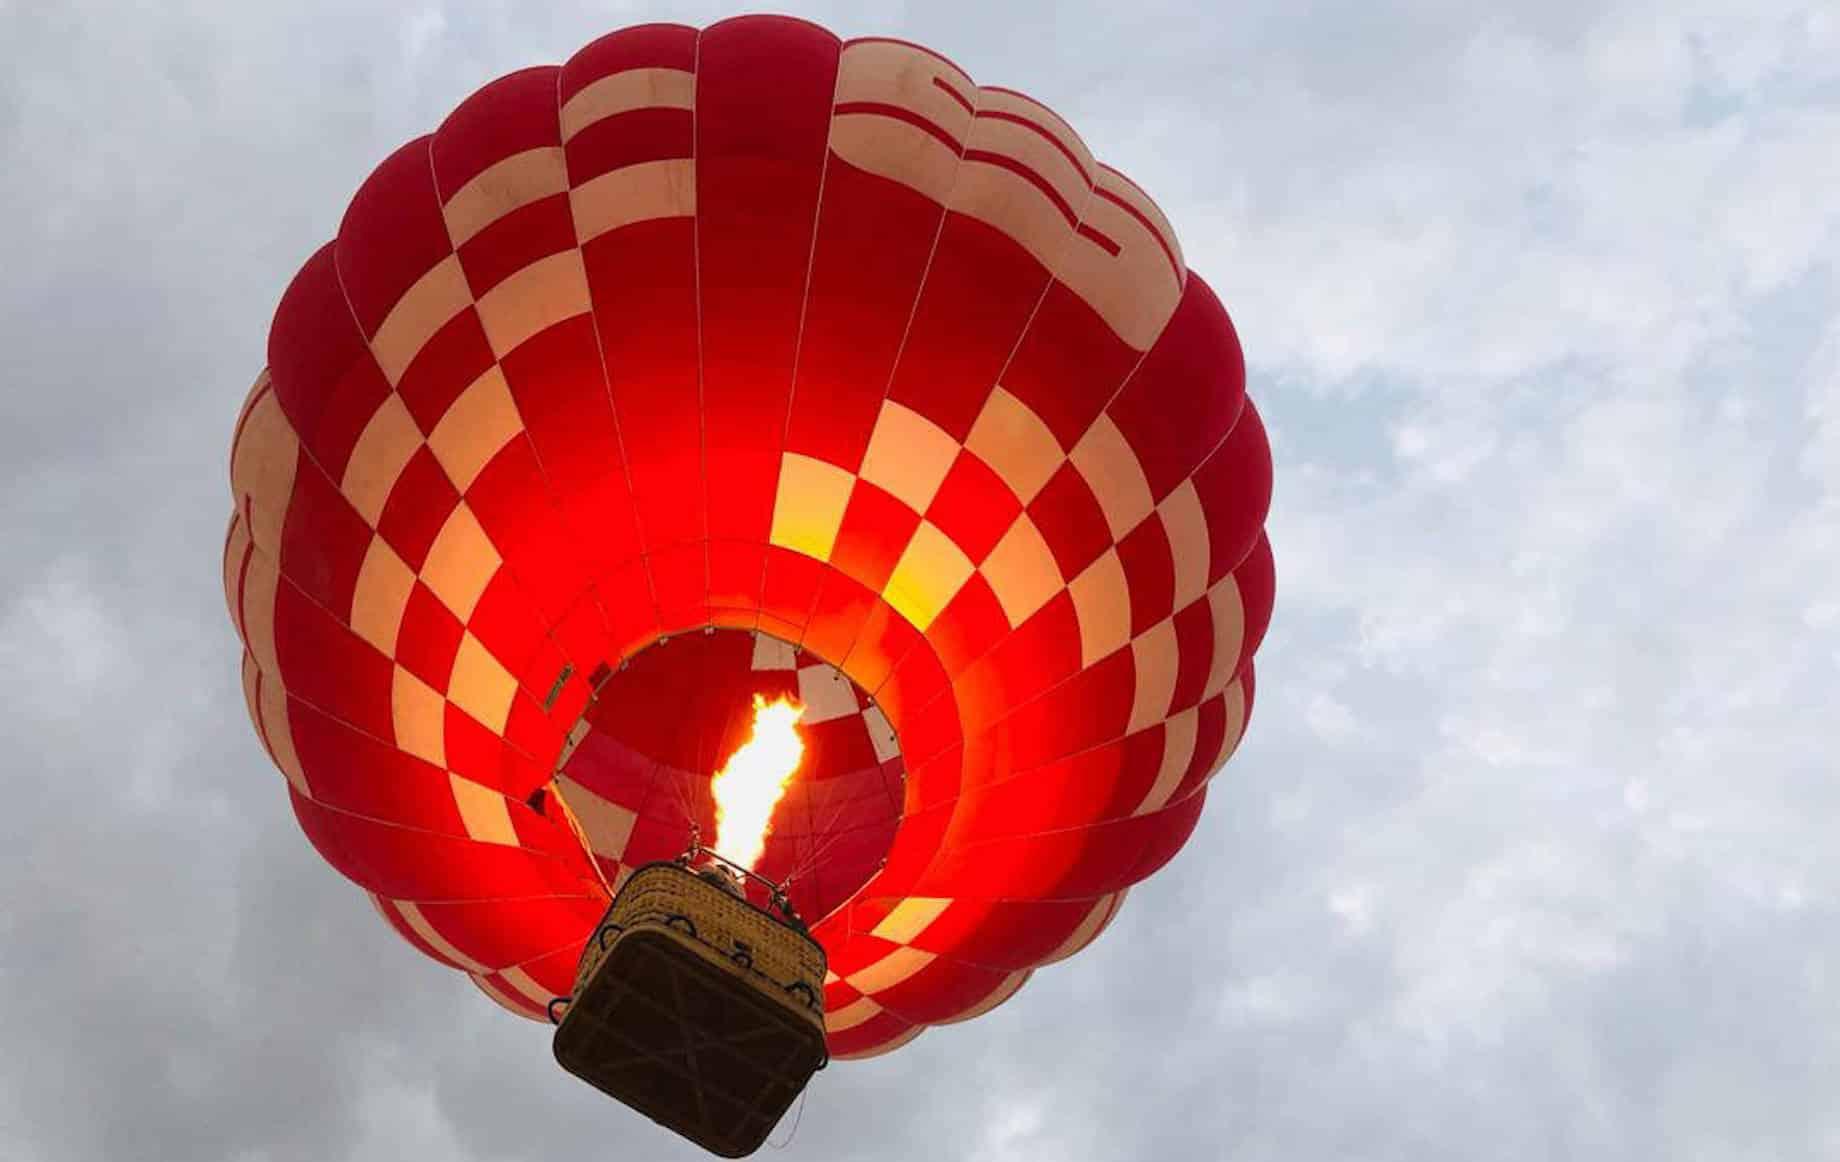 A hot air balloon in the sky